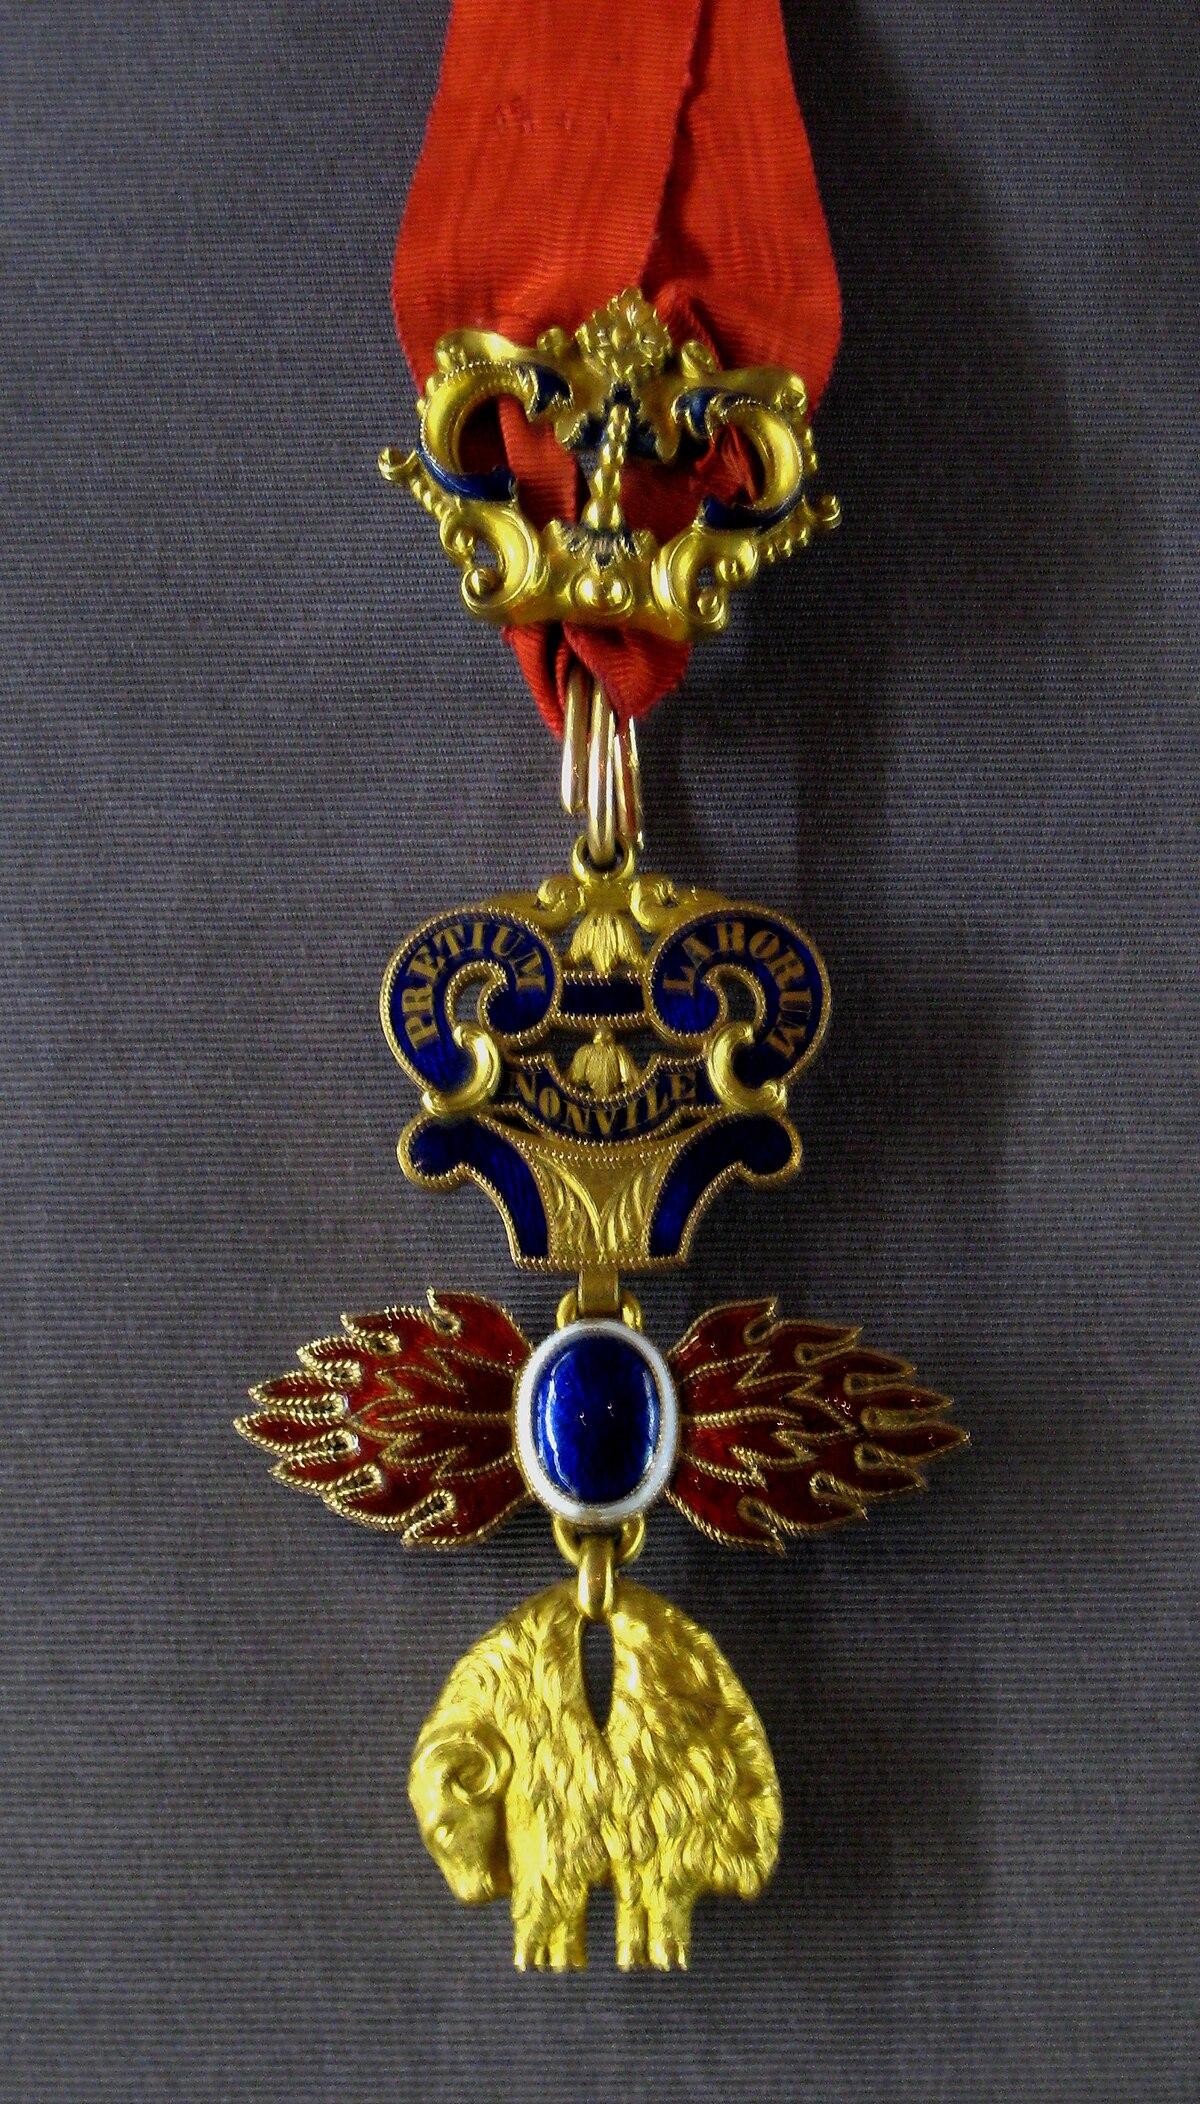 Order Of The Golden Fleece Wikidata